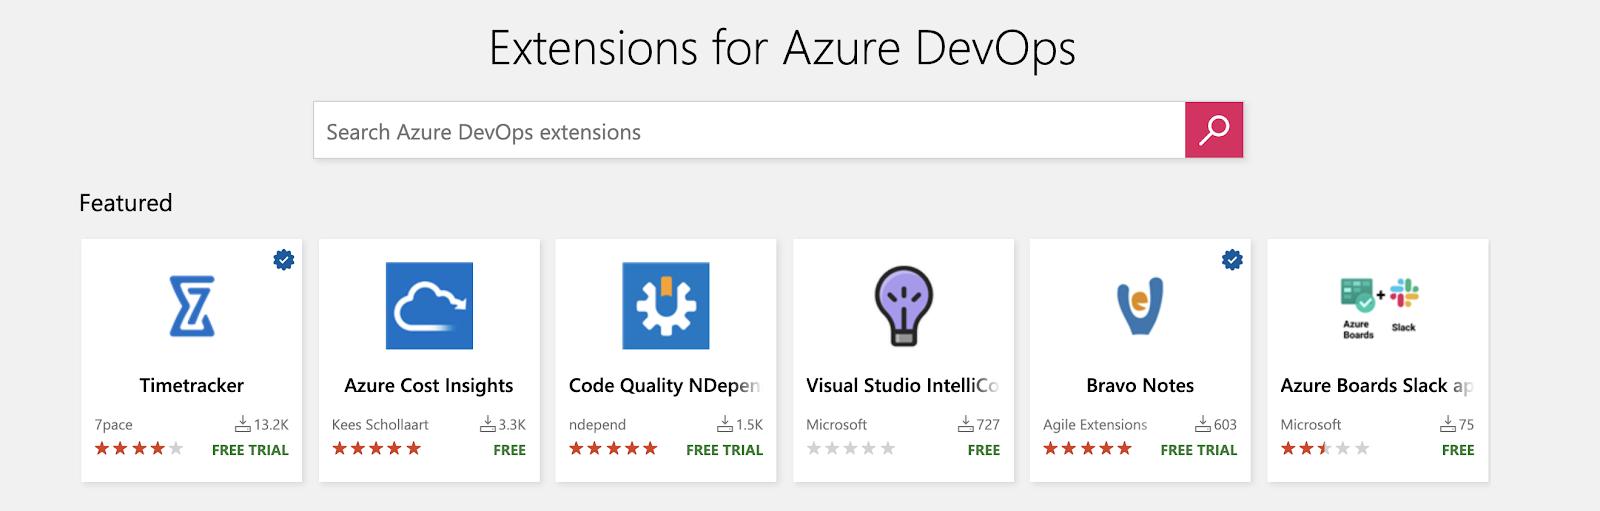 Azure DevOps extensions library